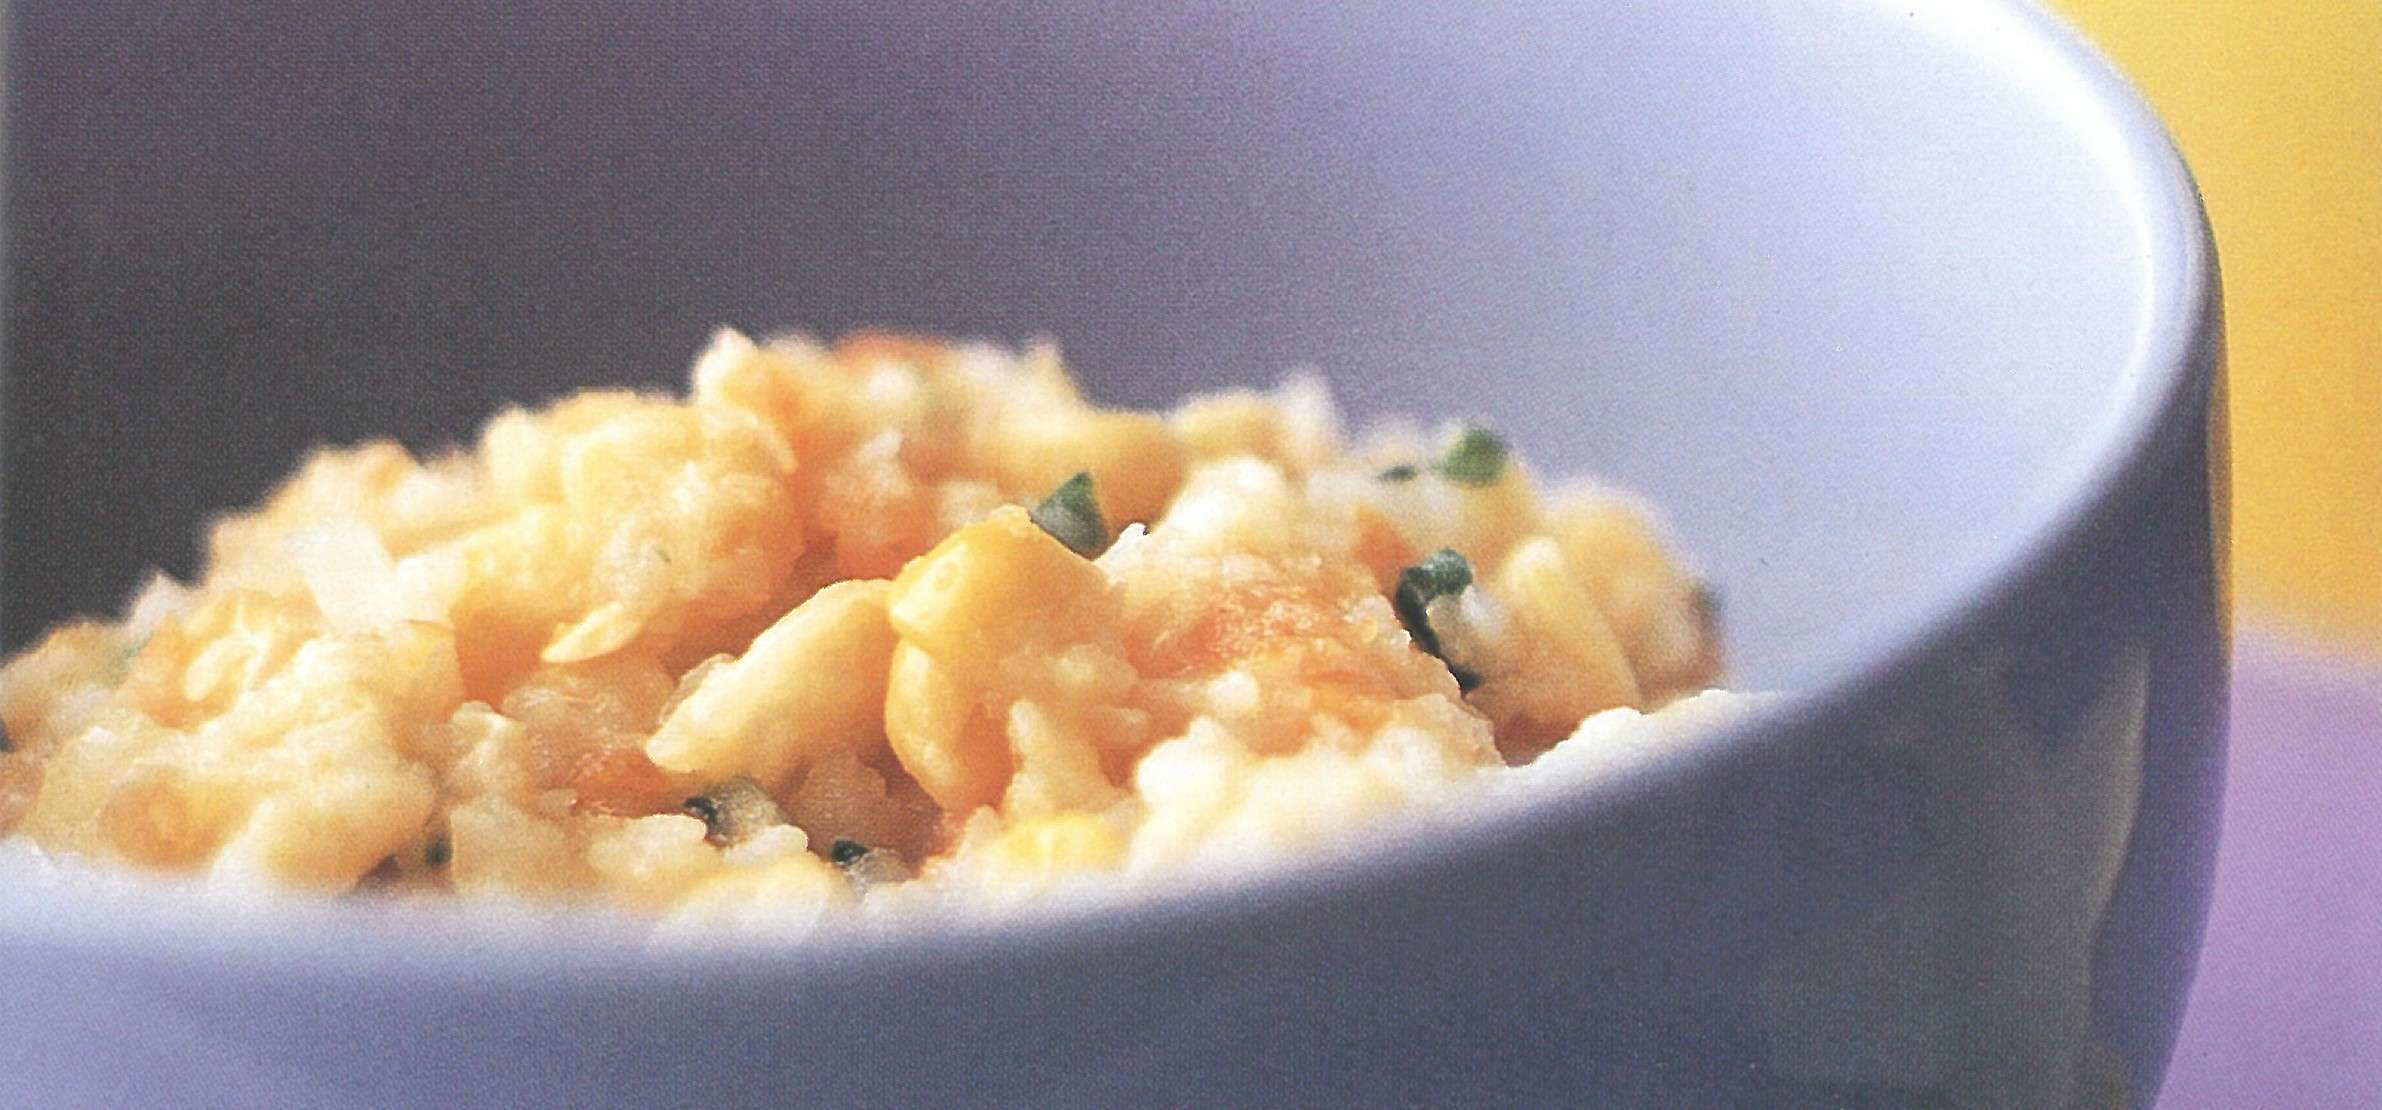 Recipe Sweet corn with potatoes